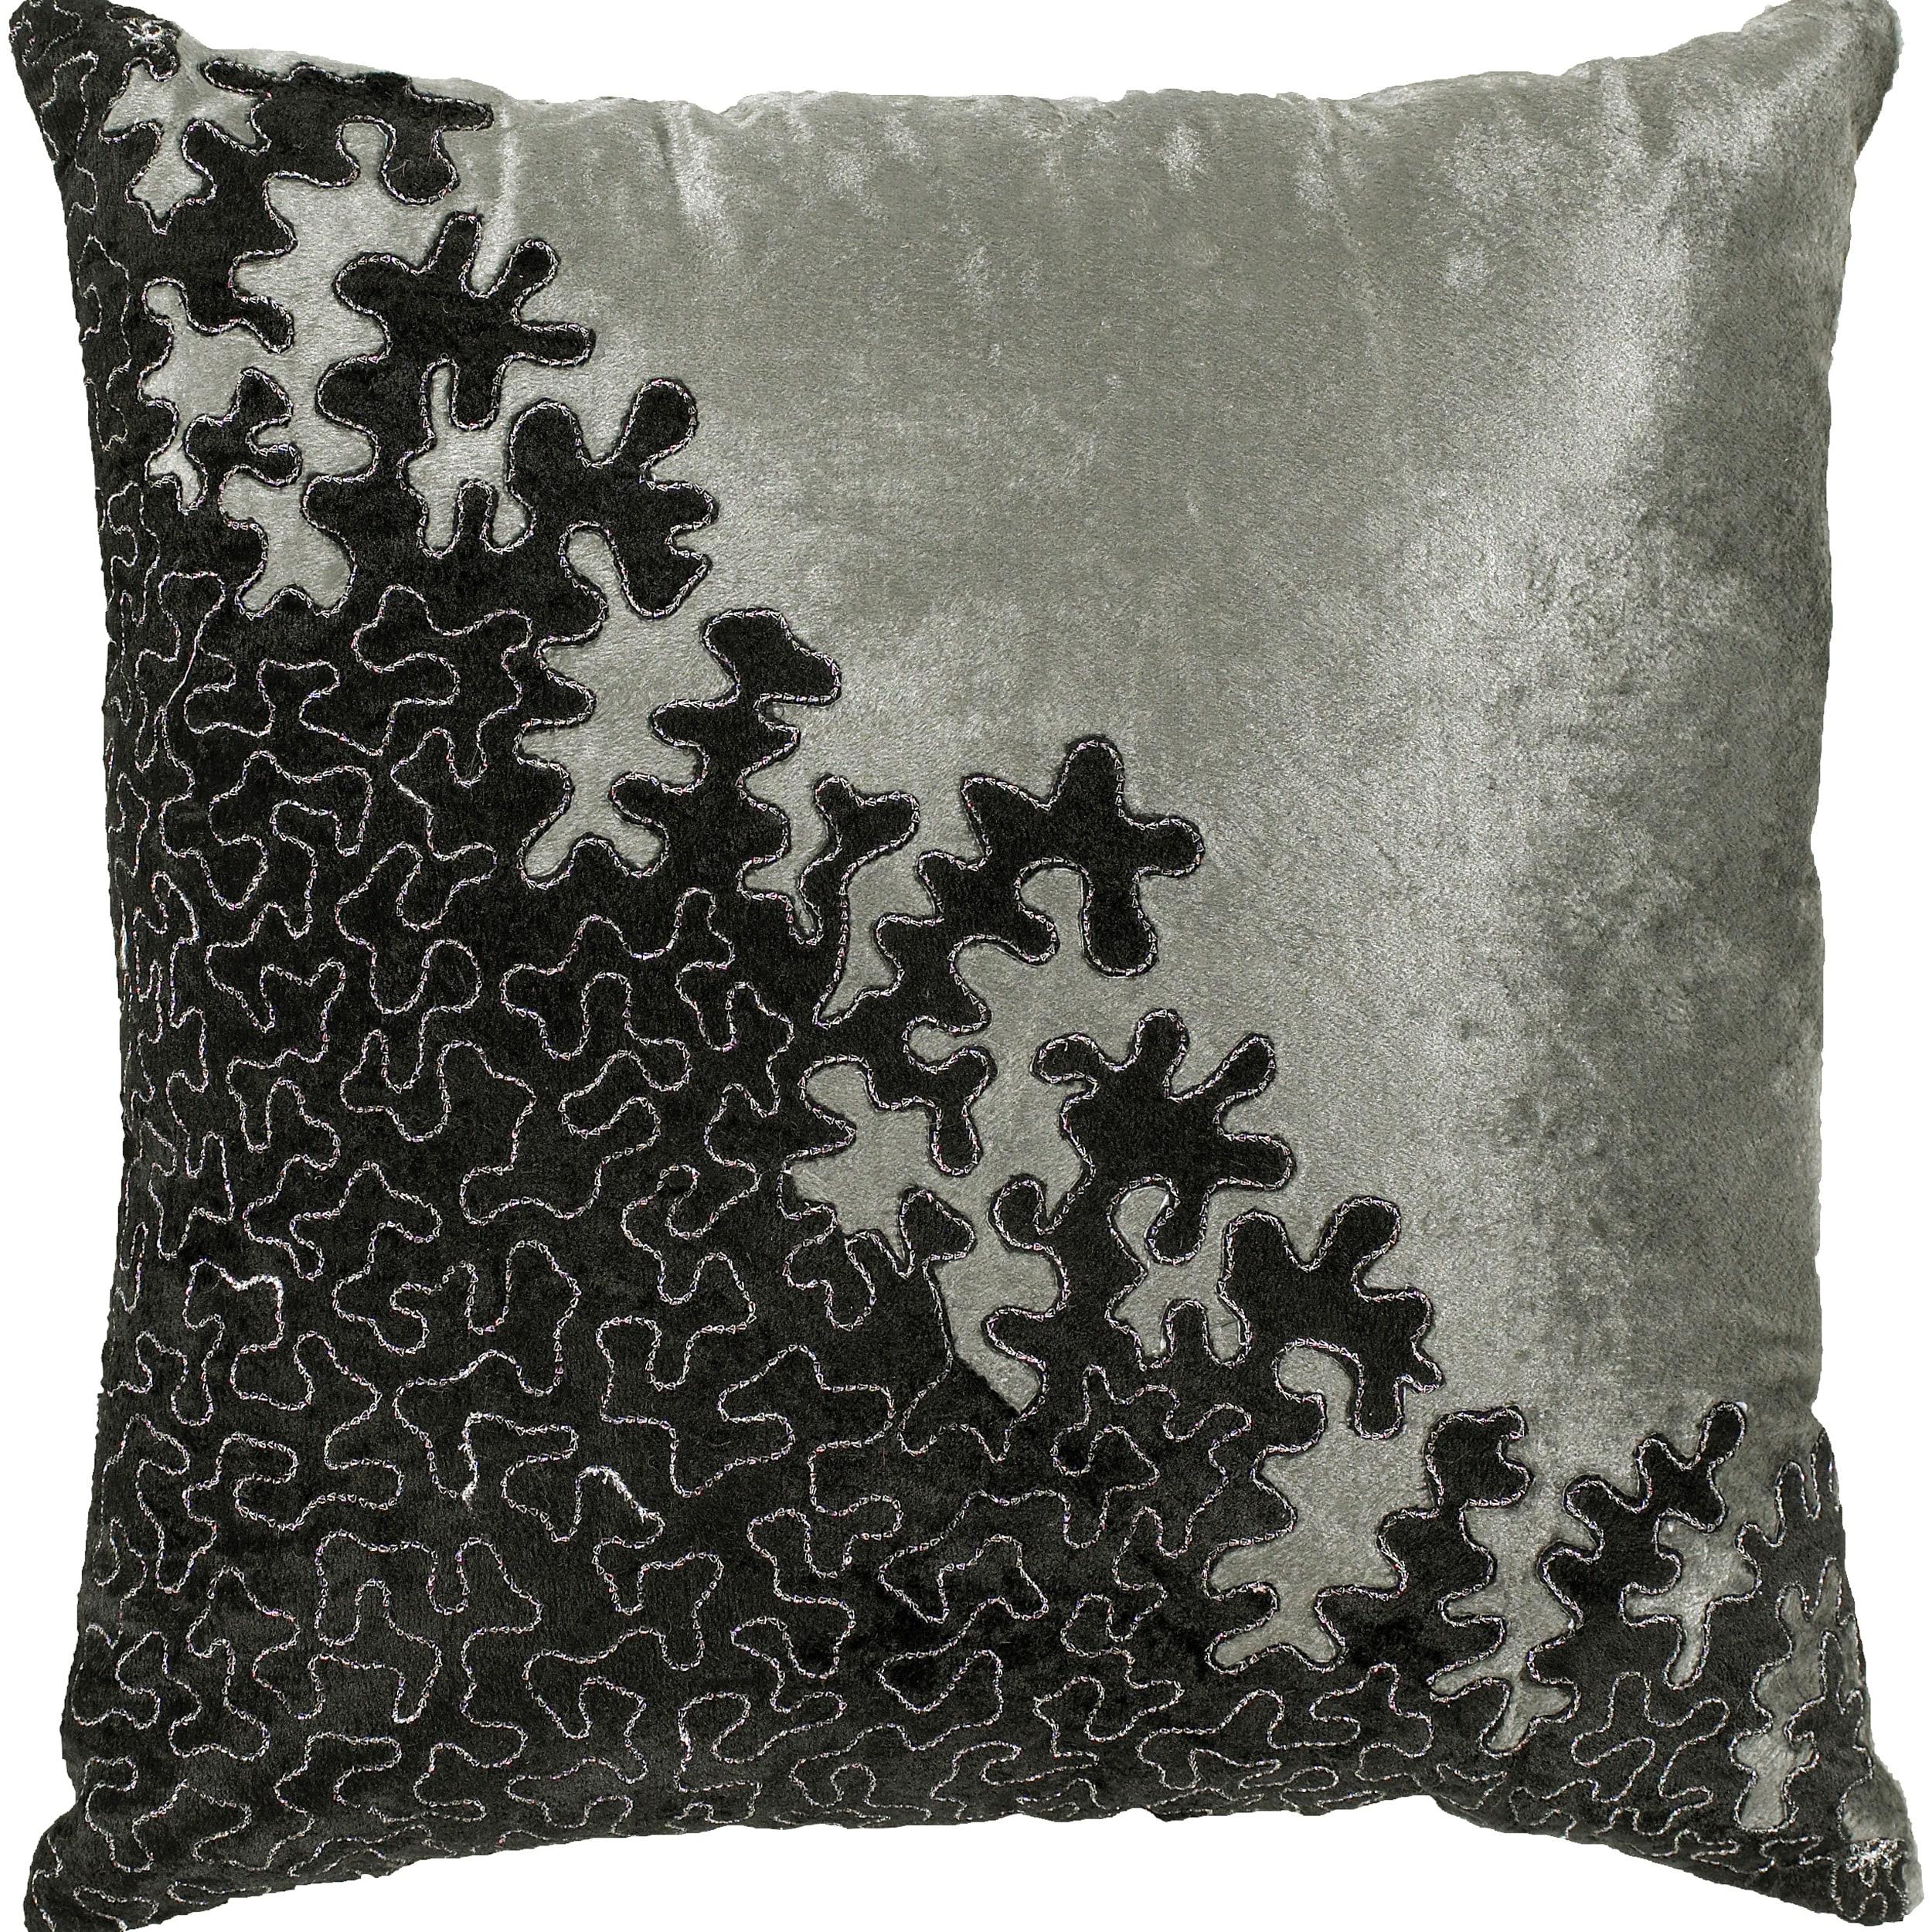 Decorative 18-inch Thun Pillow